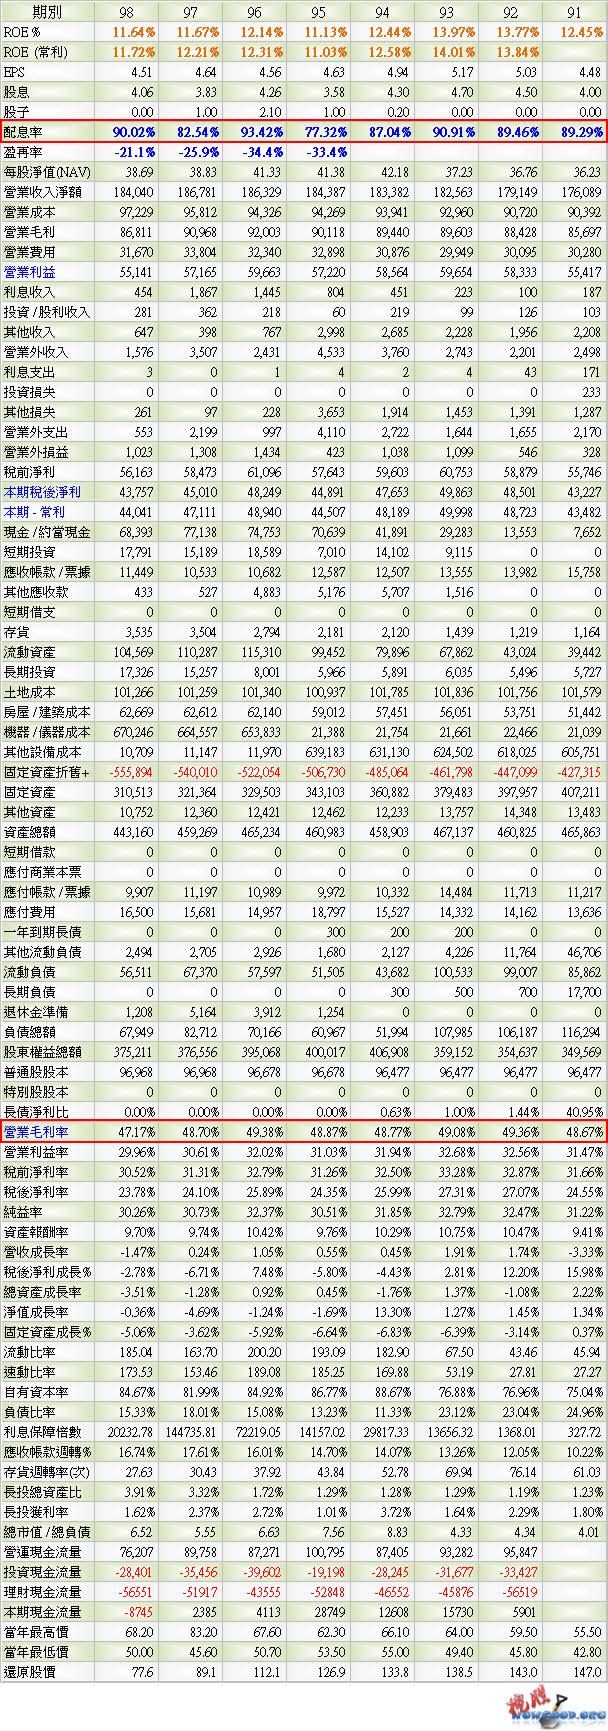 2412 中華電_年報